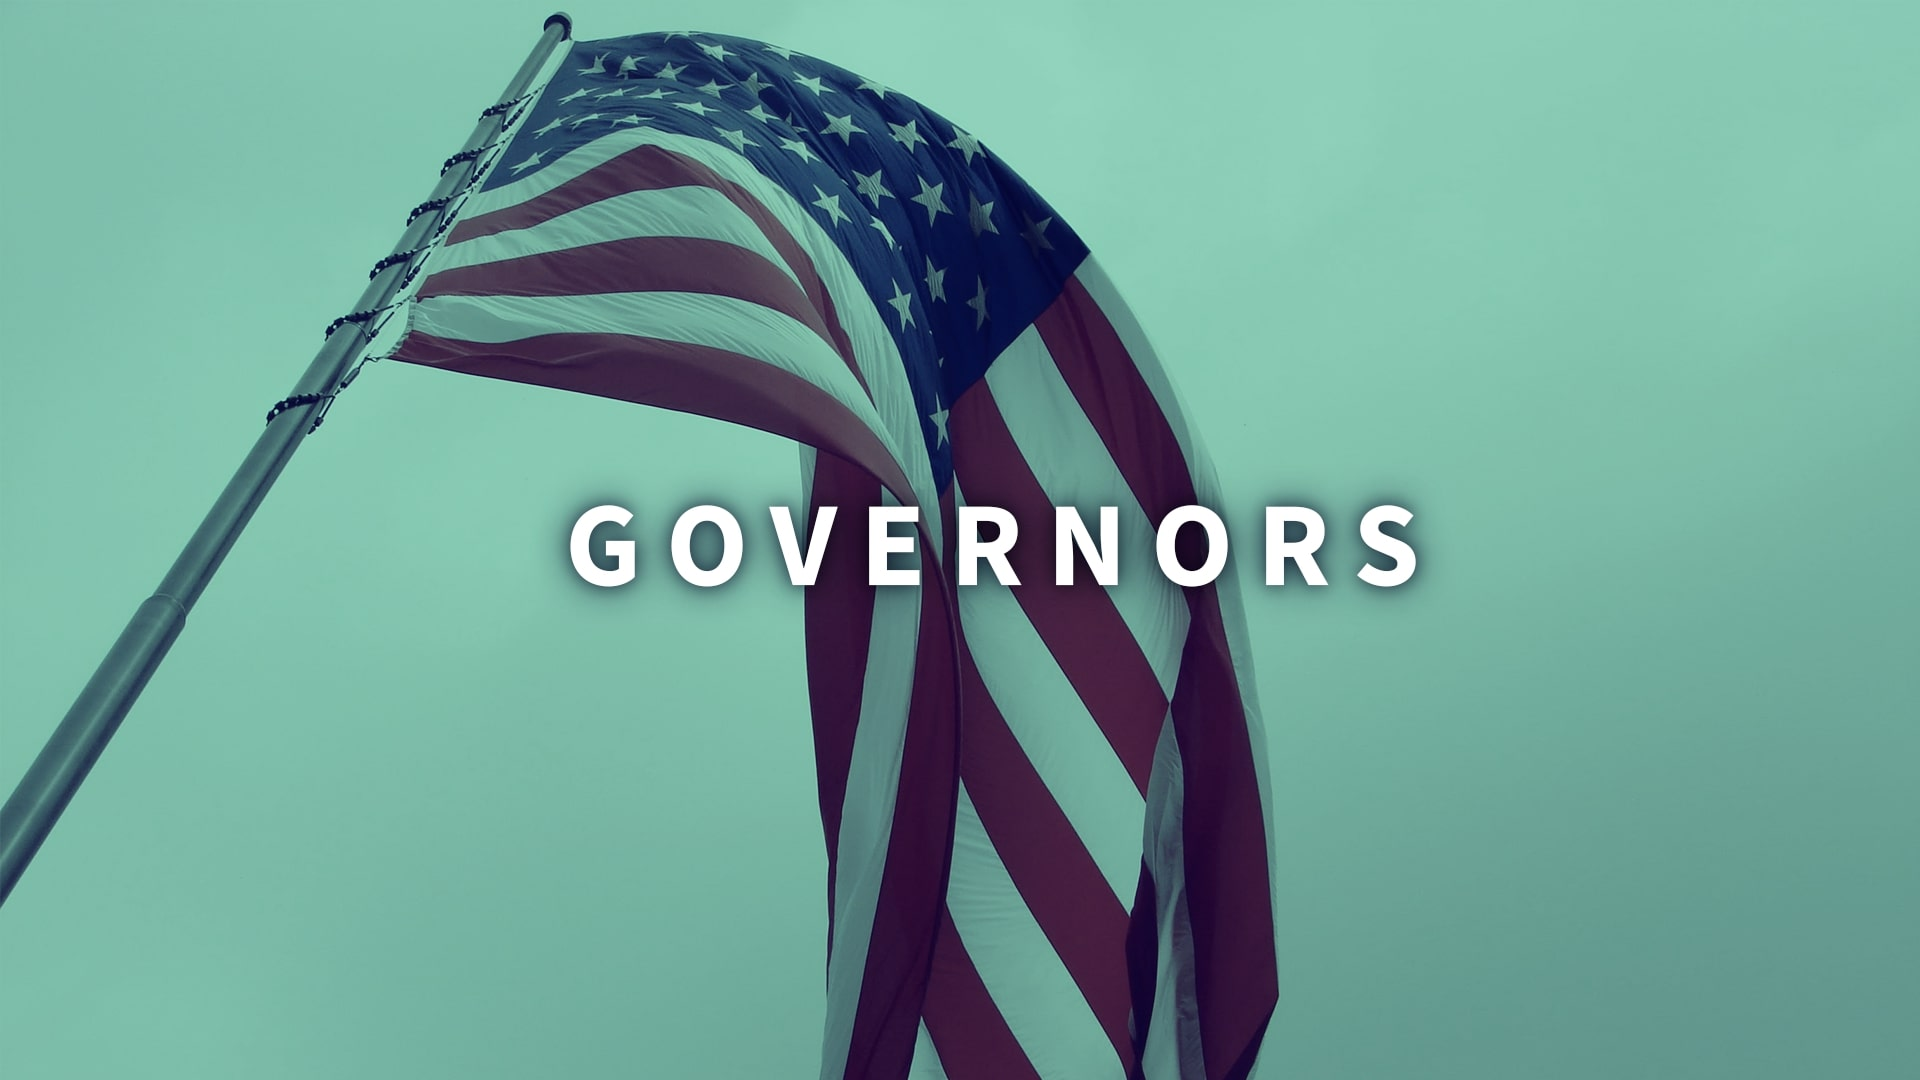 Select GOVERNOR contest